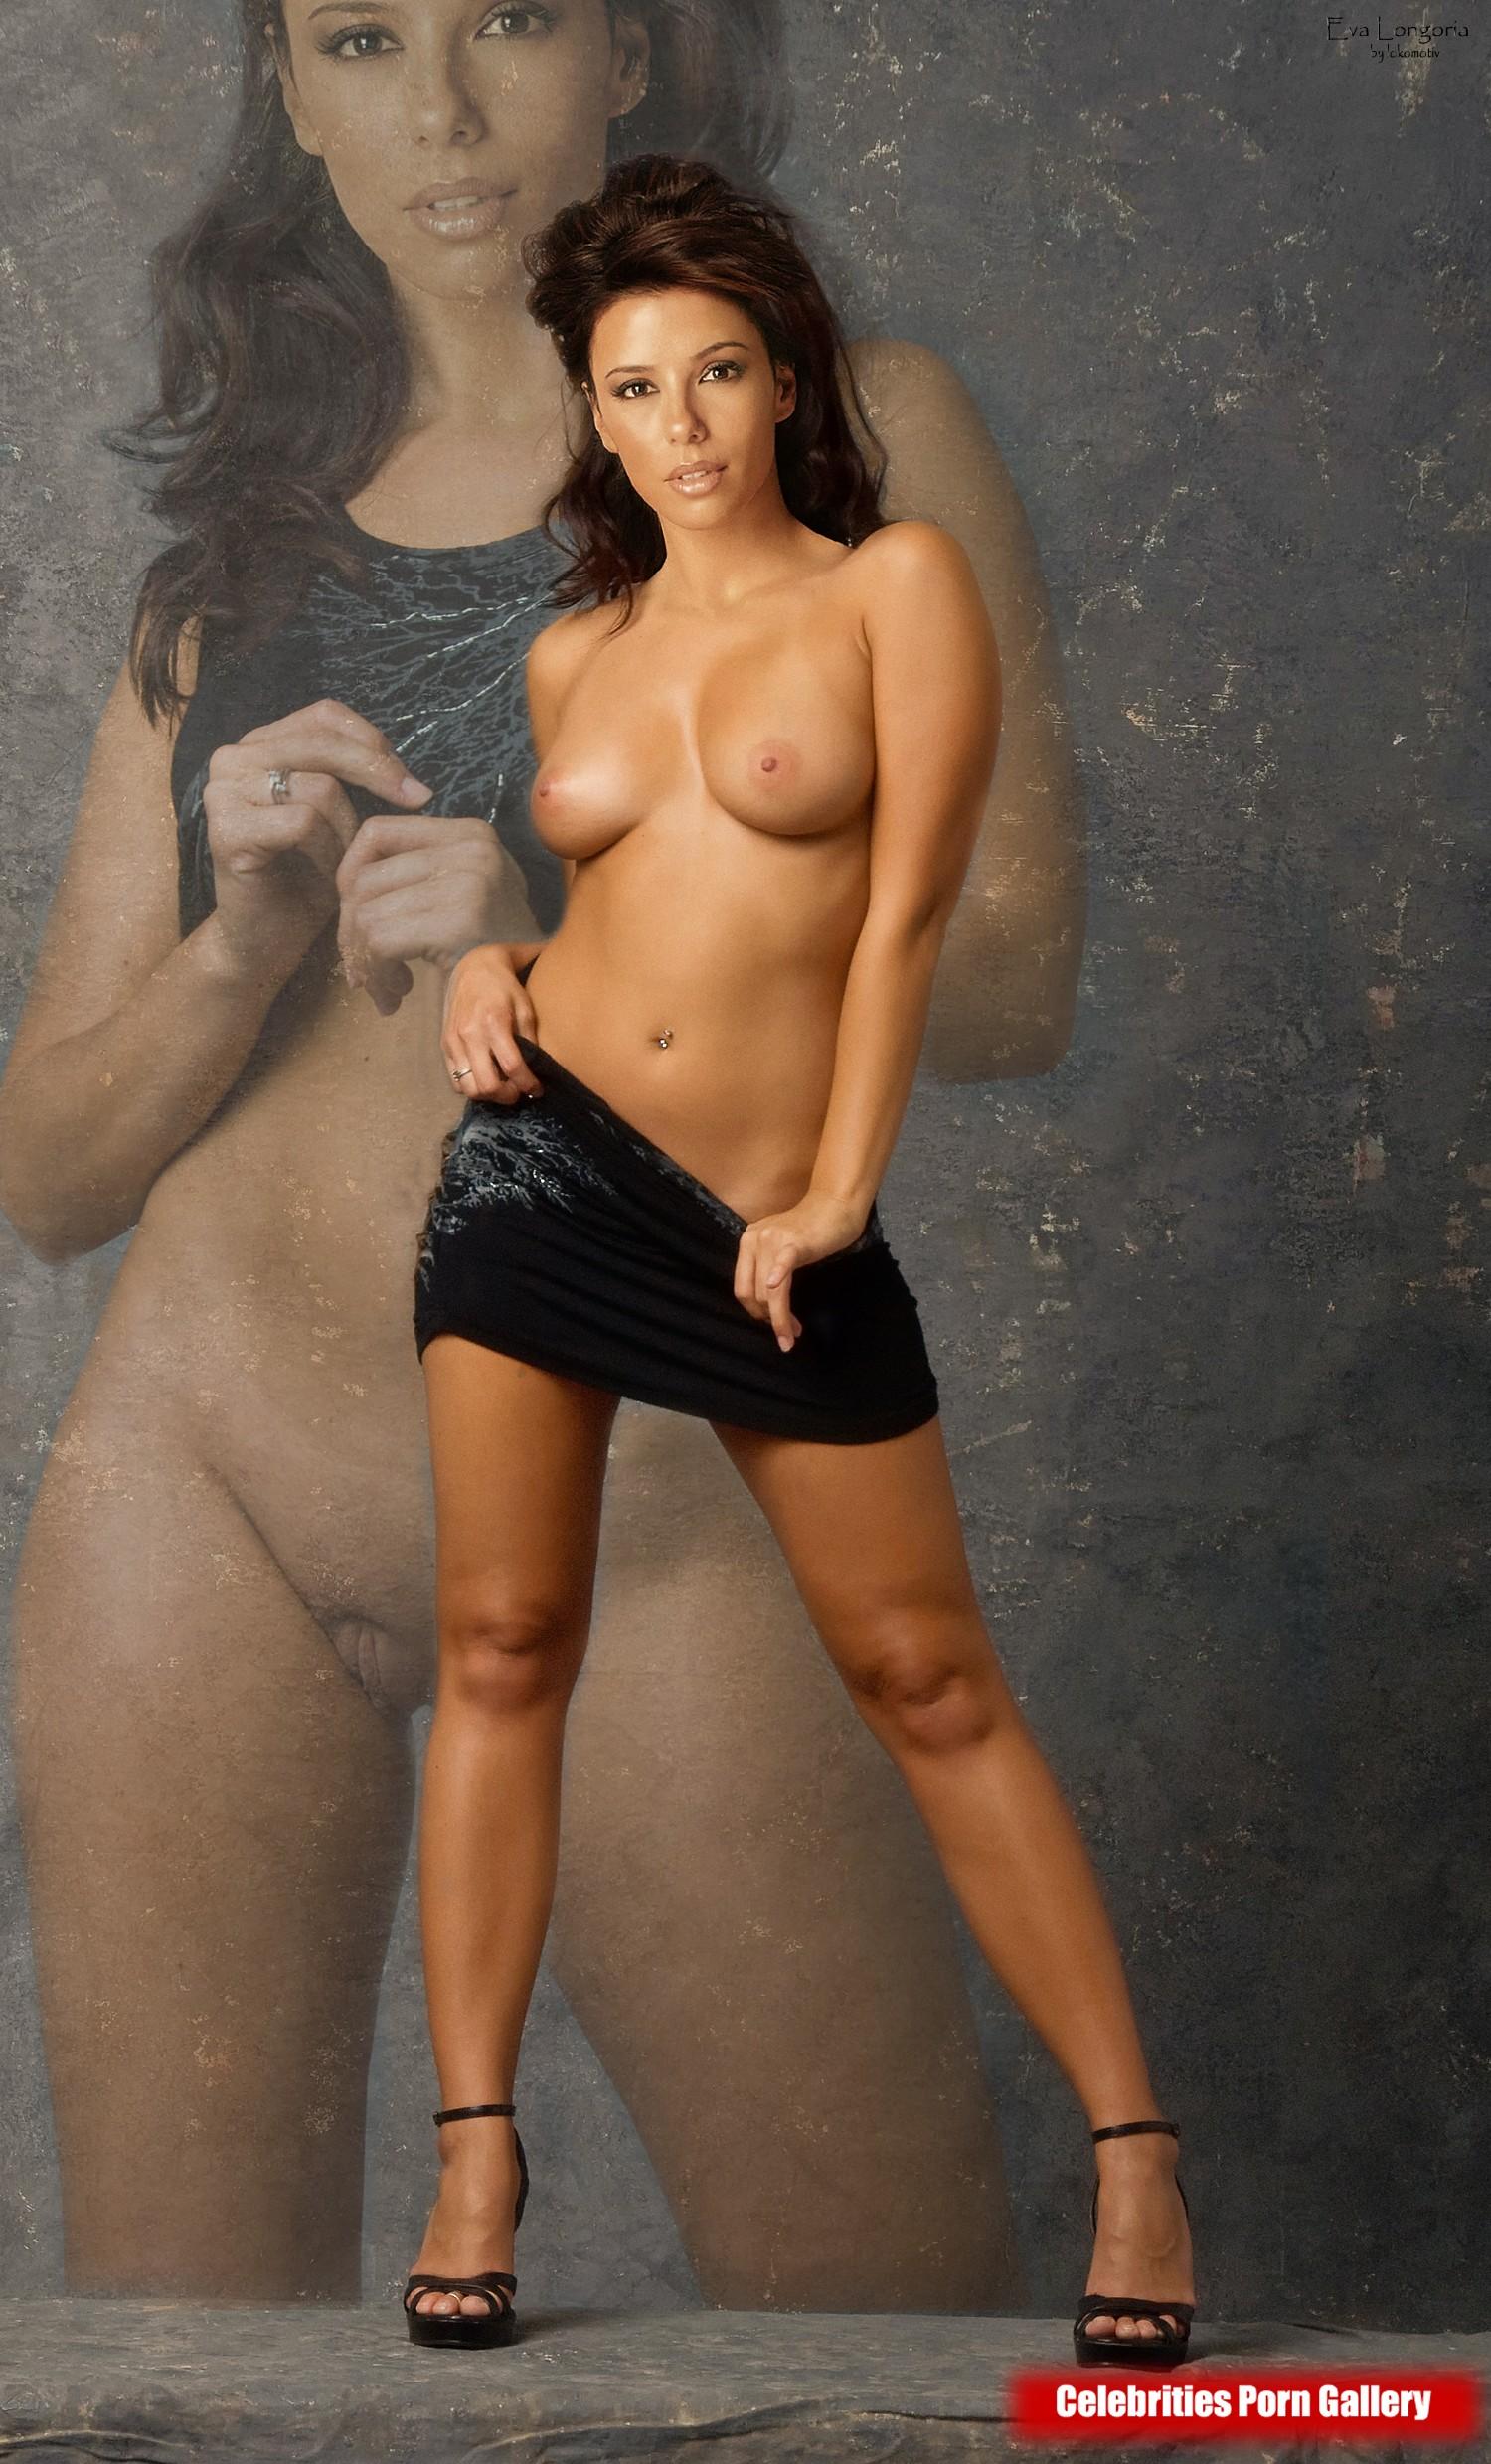 Jayme langford dildo orgasdm